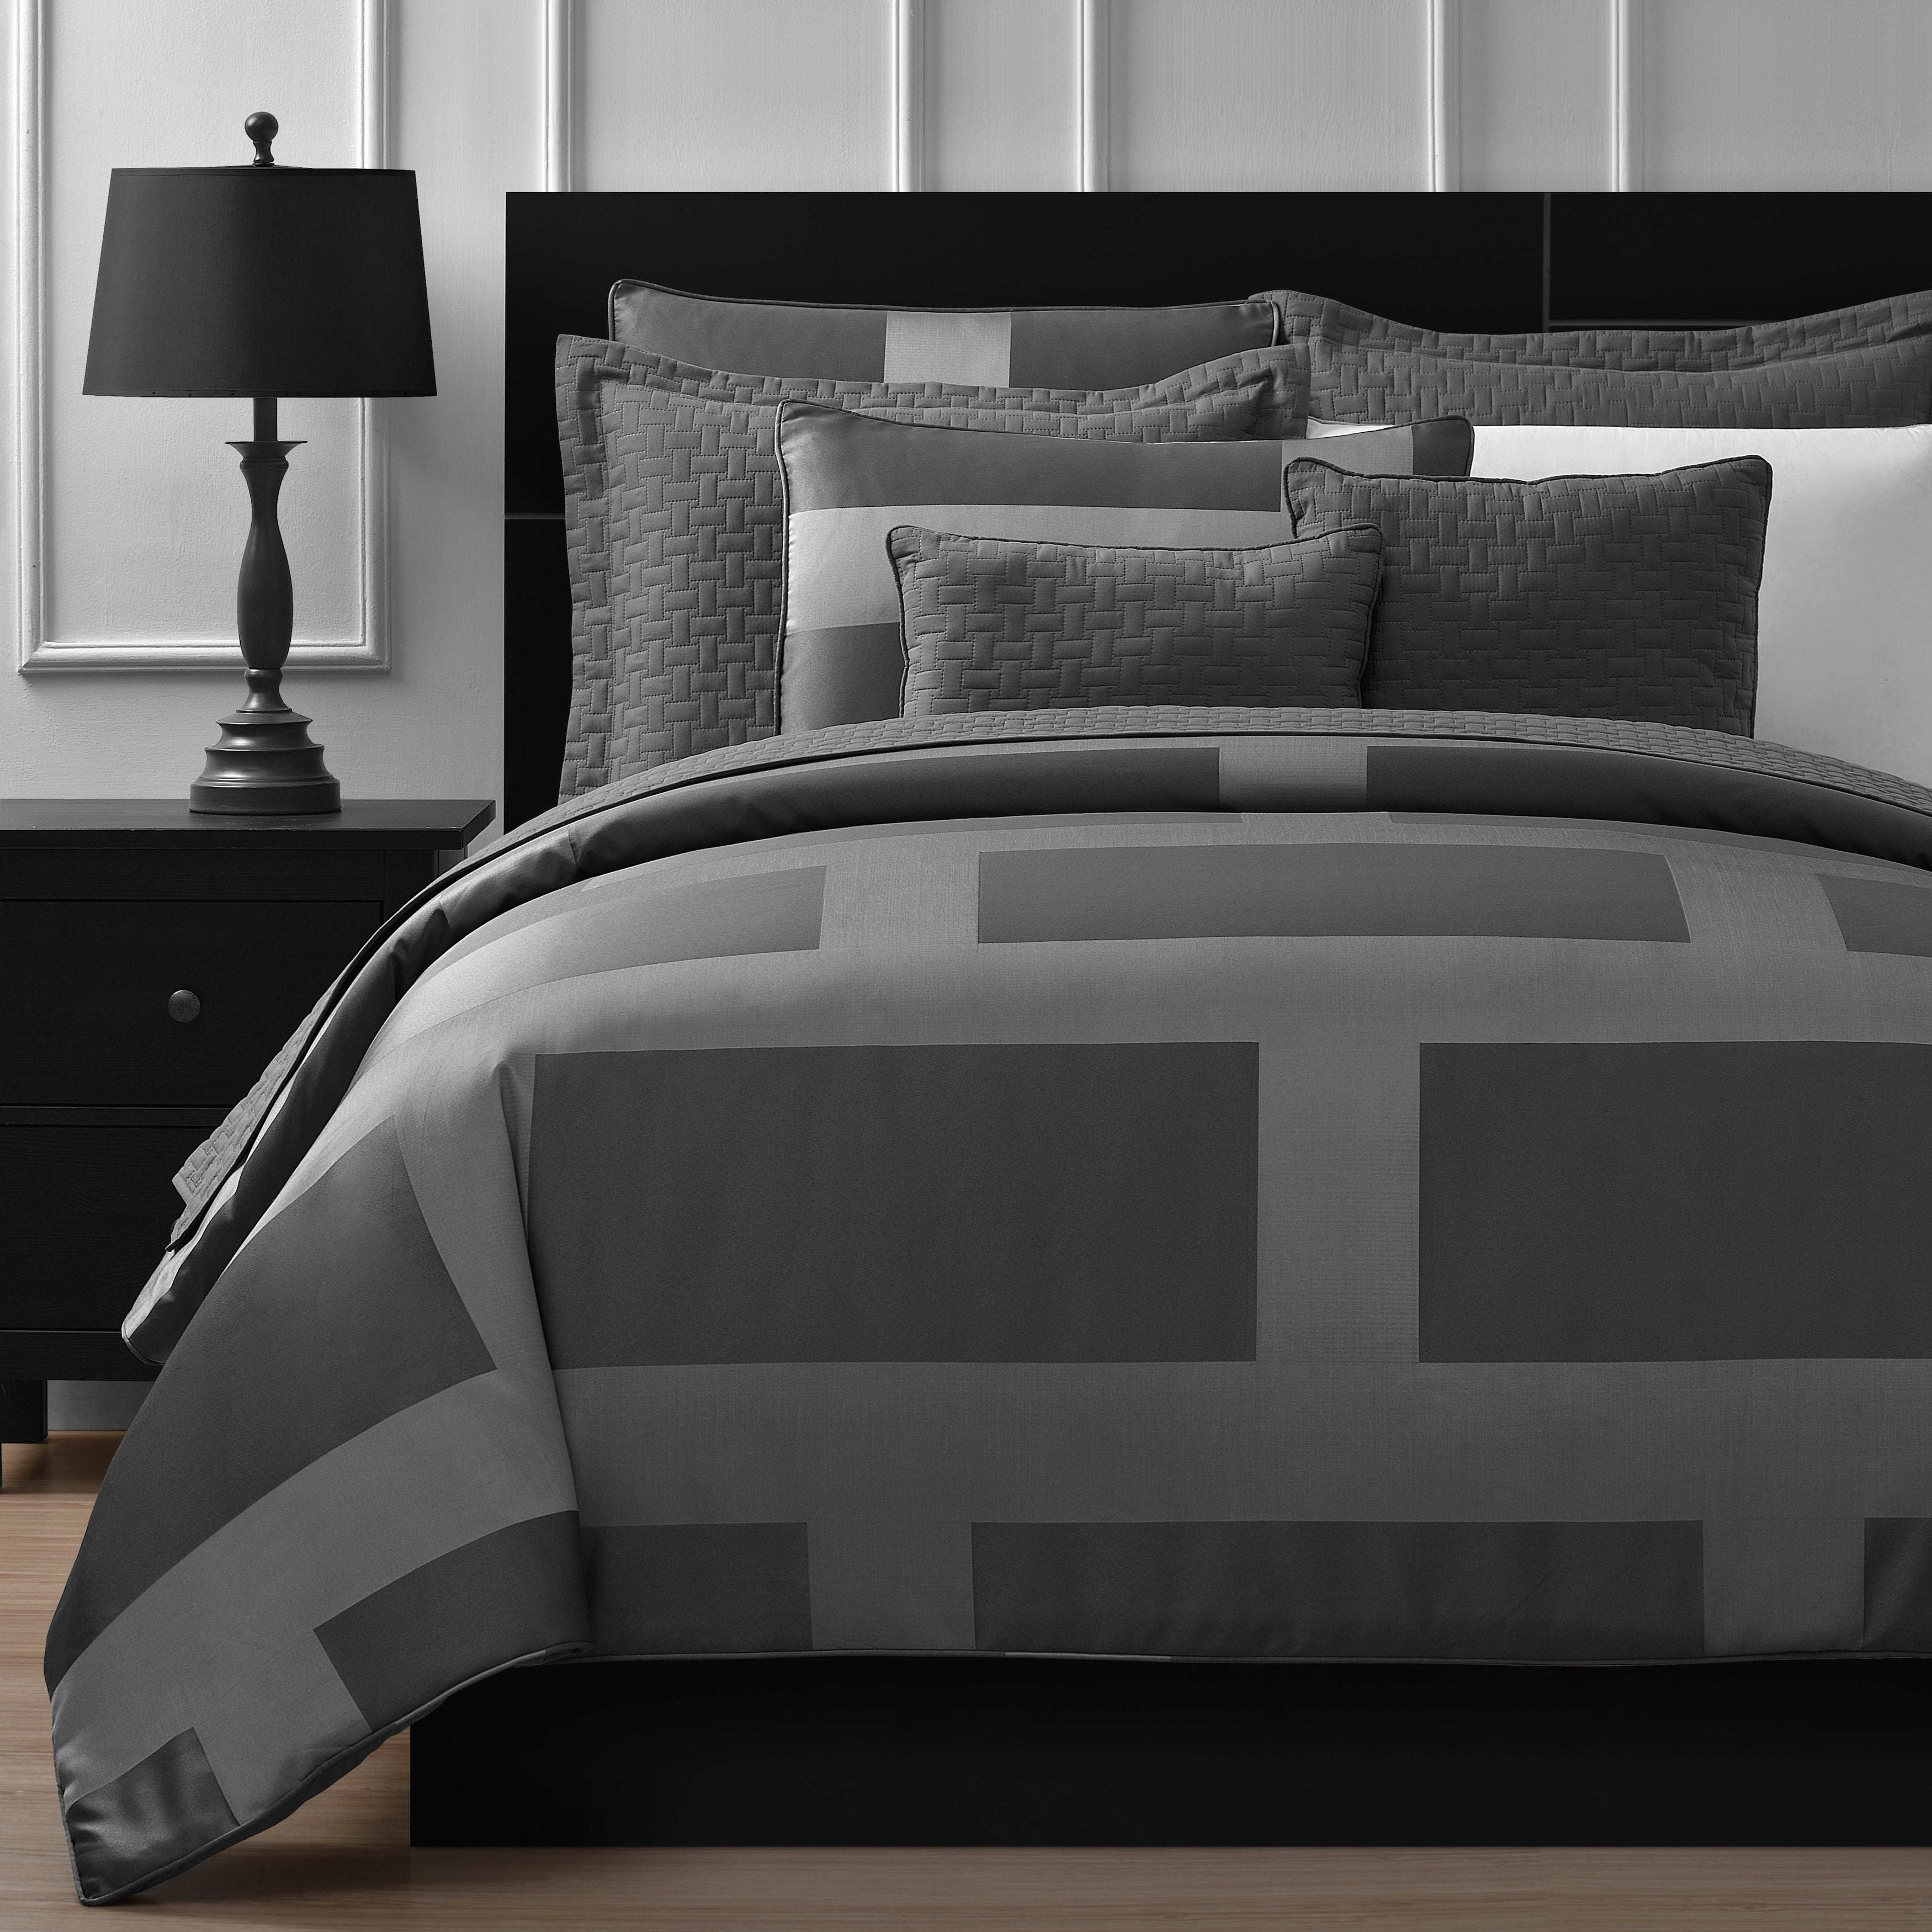 Comfy Bedding Frame Jacquard 5-piece Comforter Set (As Is...